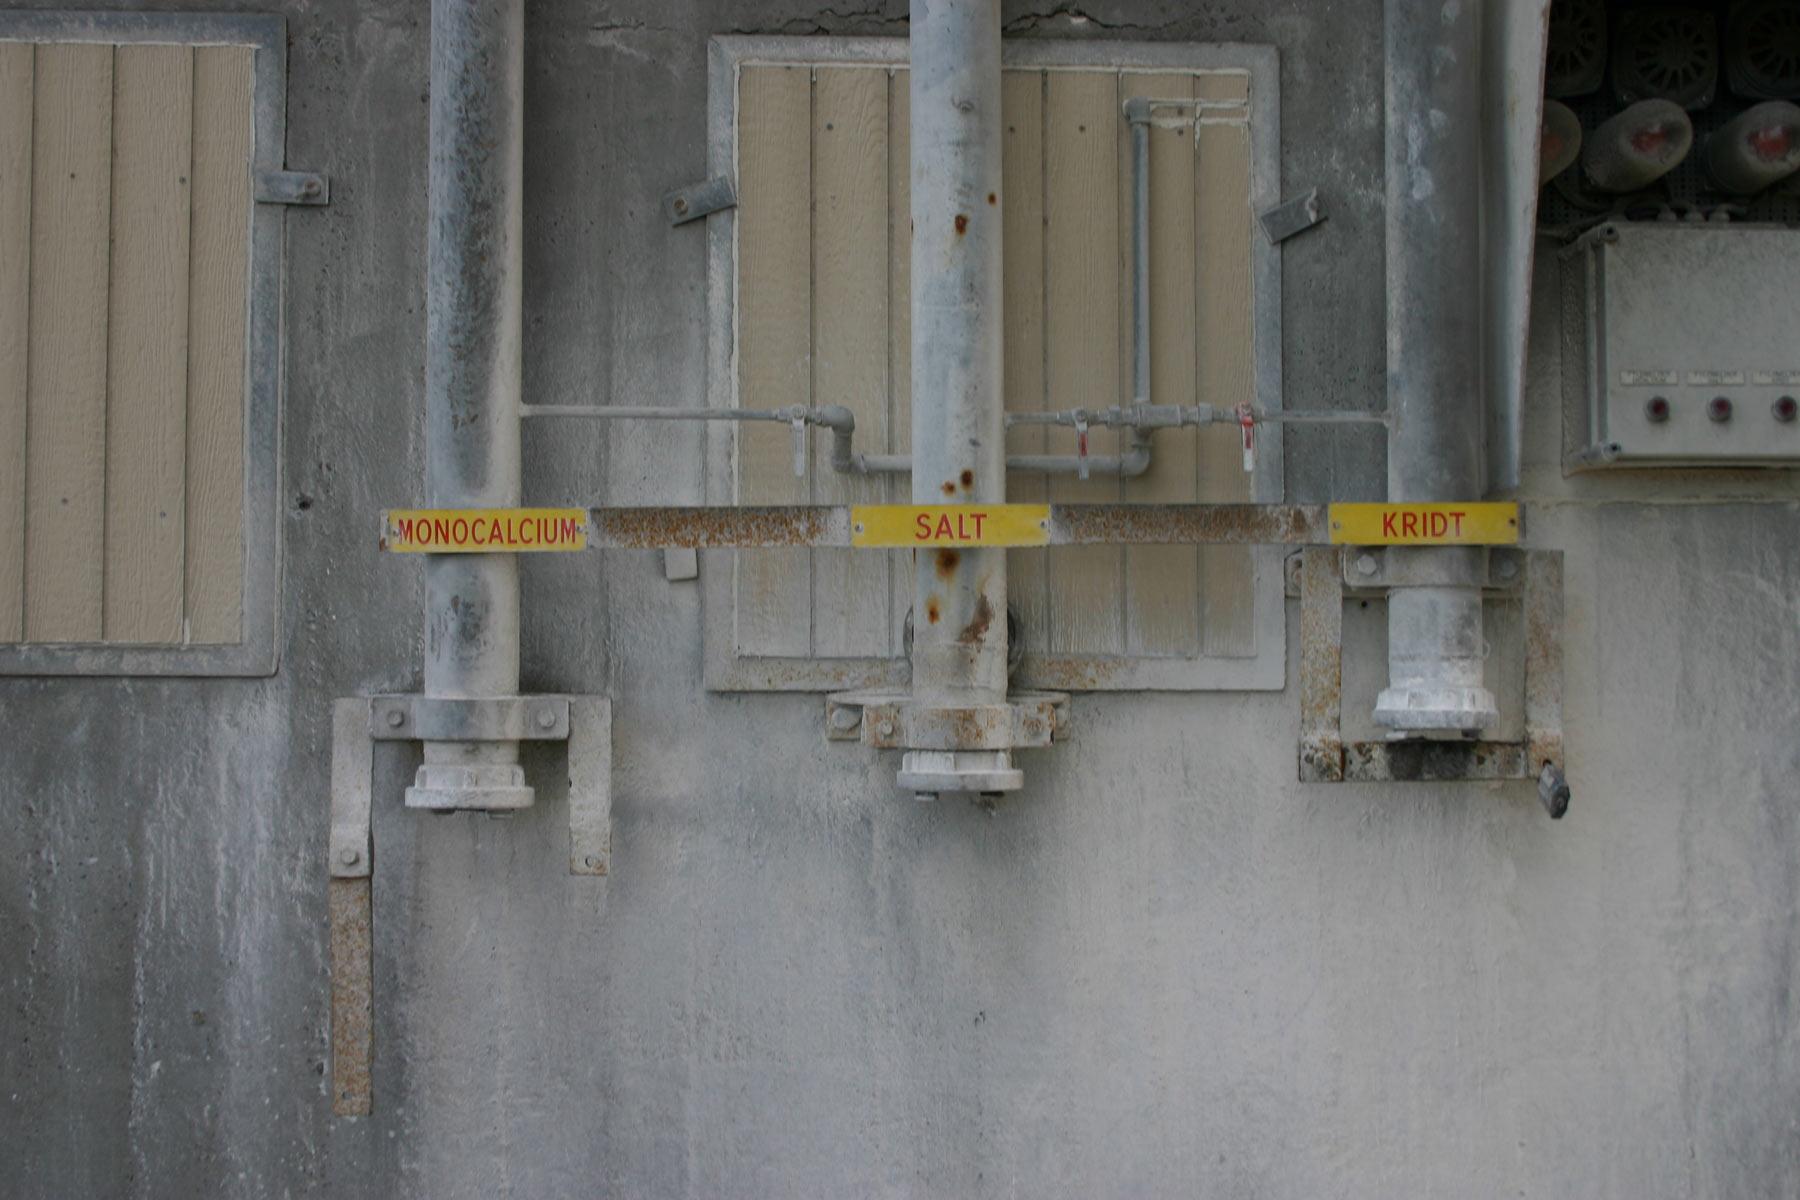 Pipes, Closure, Concrete, Construction, Industrial, HQ Photo